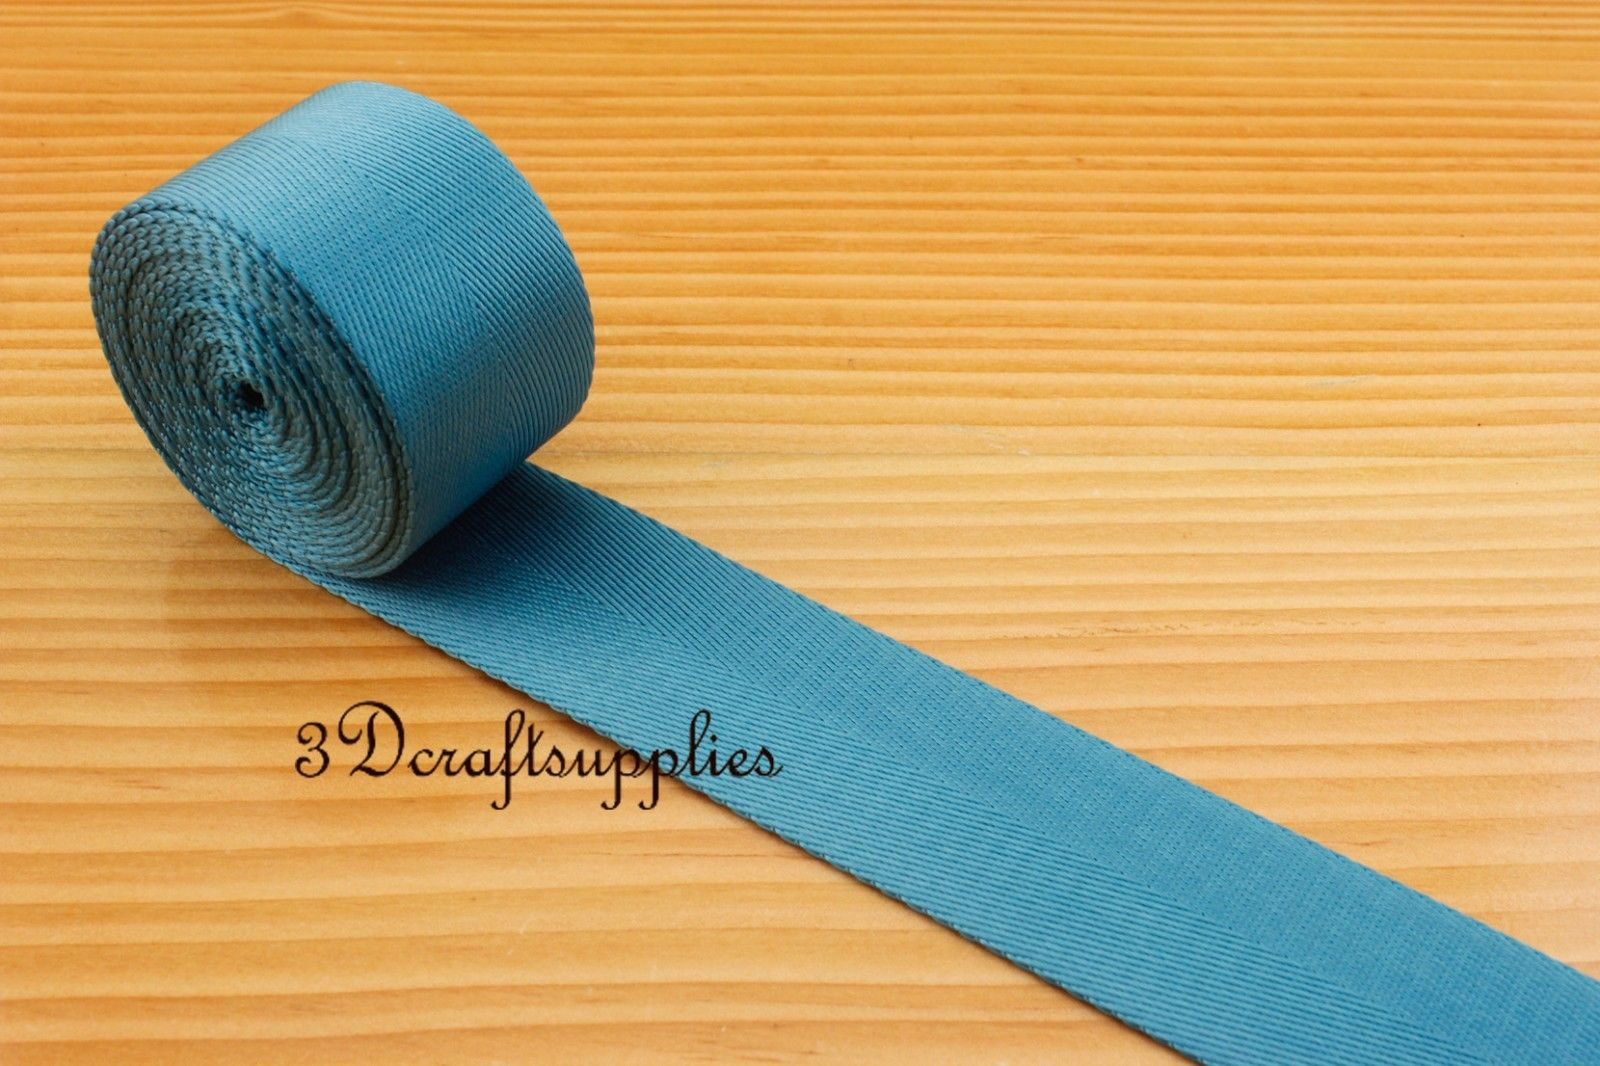 5 Yards 1.5 Inch(38mm) Heavy Weight Nylon Webbing For Key Fob Strap BLUE ZA92